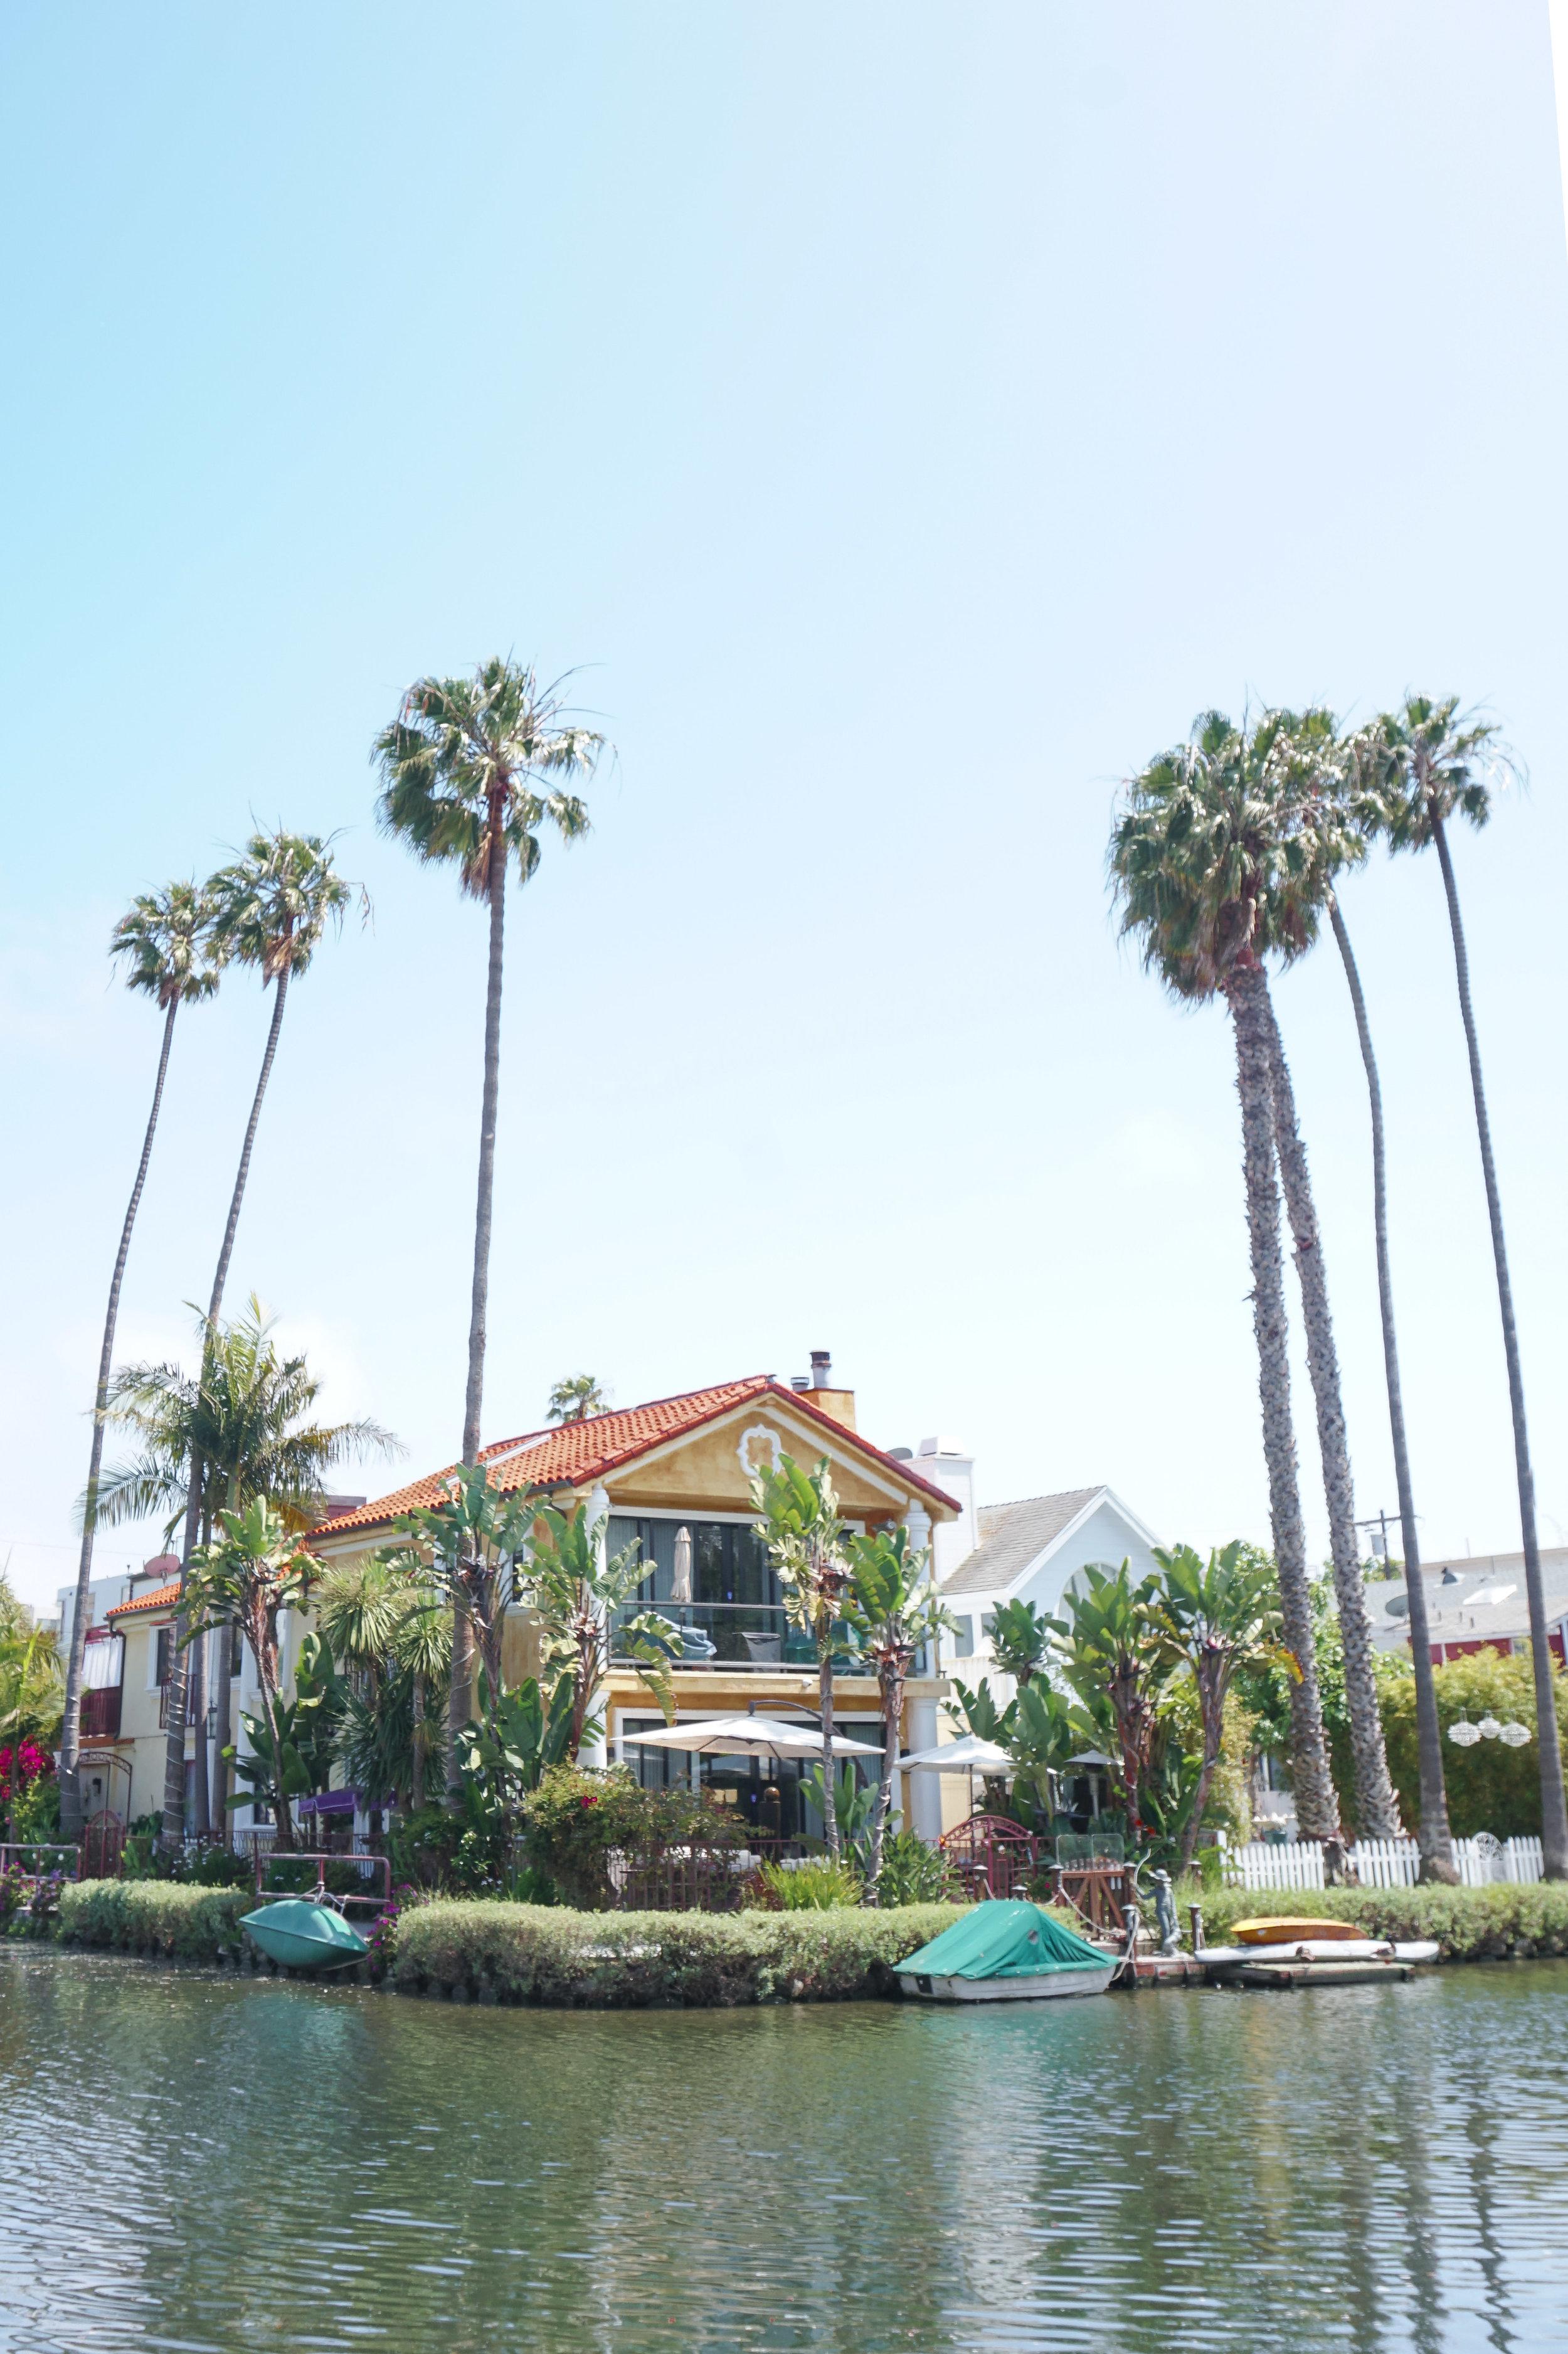 curio.trips.usa.california.los.angeles.venice.canals.corner.house.palm.trees.portrait.jpg